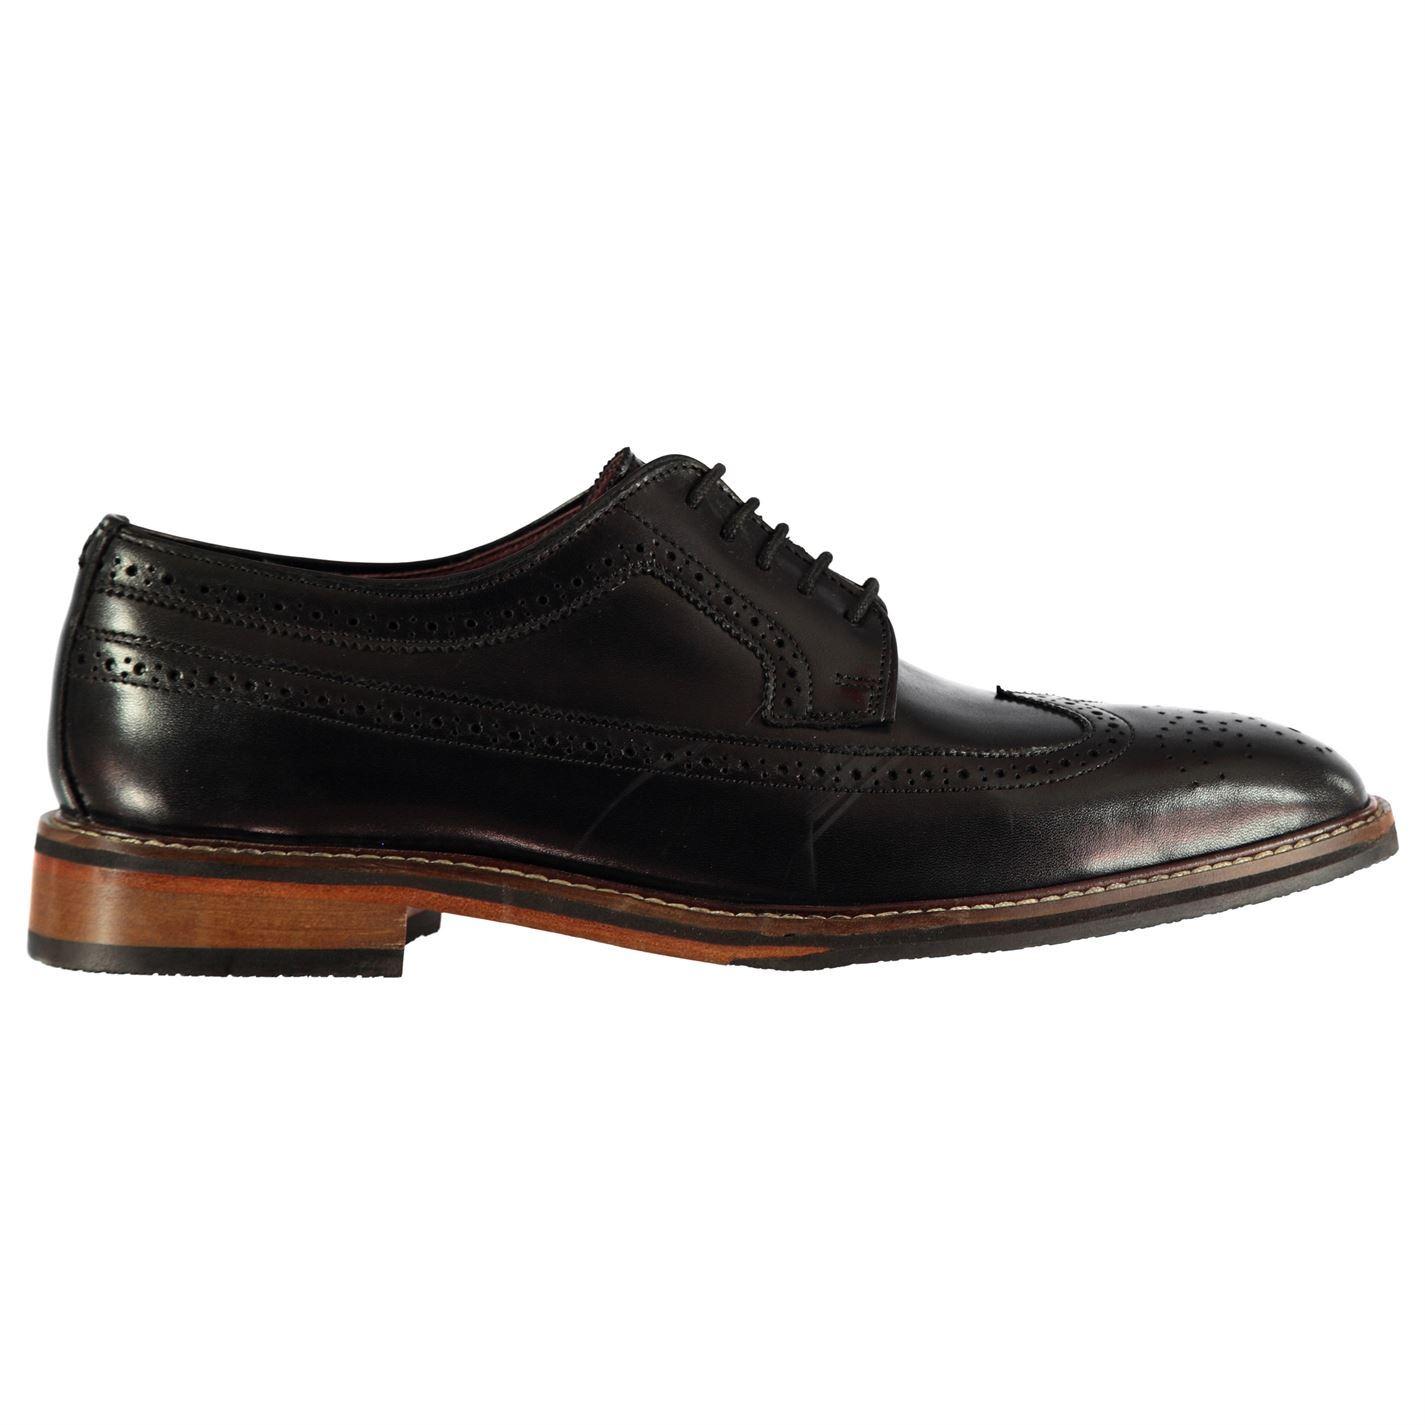 Firetrap Negroseal Hampshire Hampshire Hampshire Brogue Zapatos para hombre Cuero Calado Con Cordones costura tonal 4f01eb